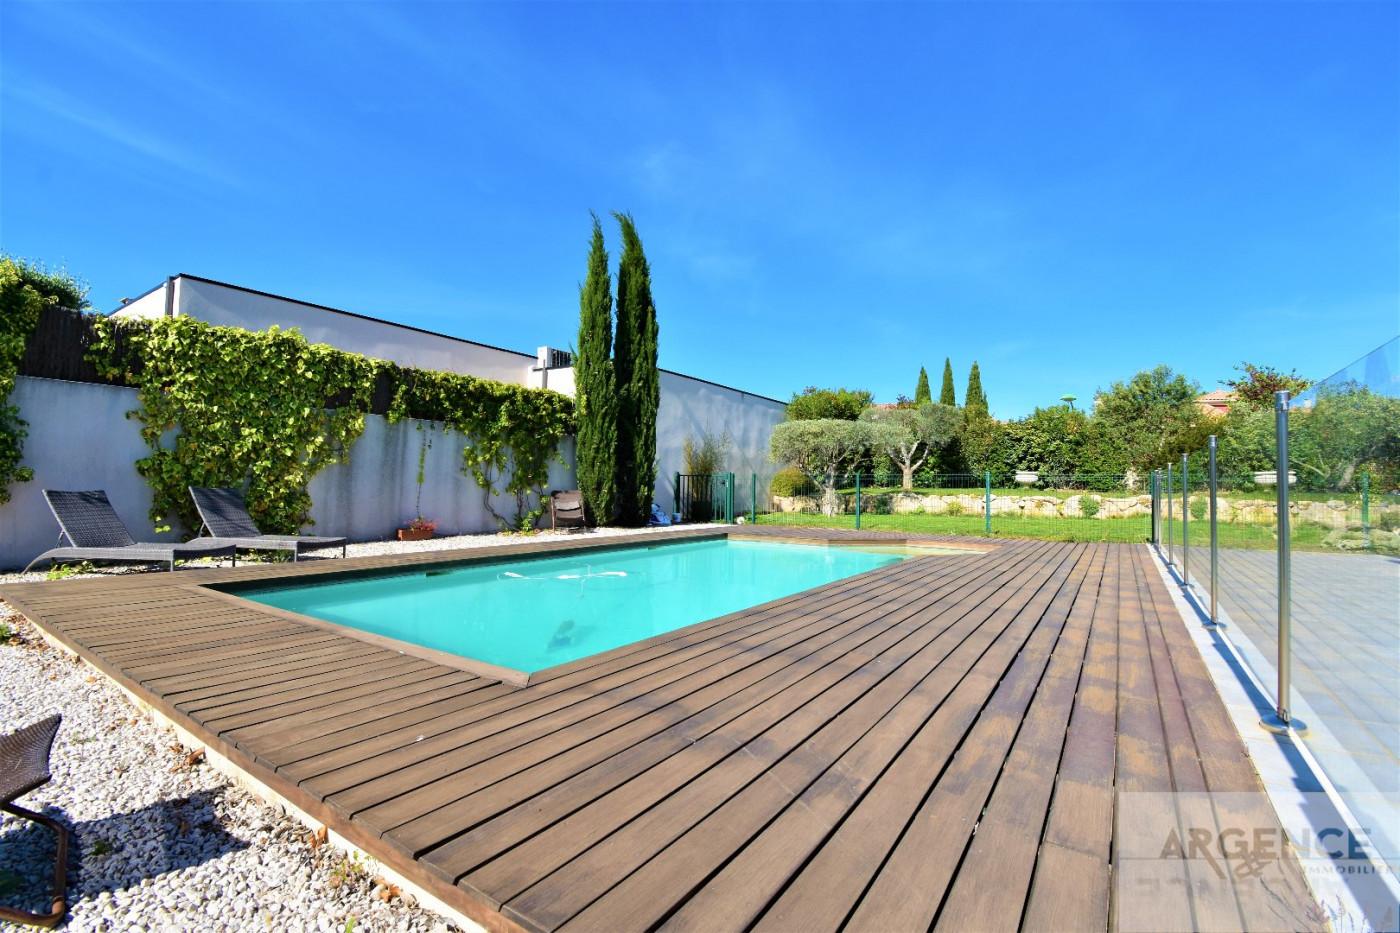 A vendre  Montpellier | Réf 345335755 - Argence immobilier